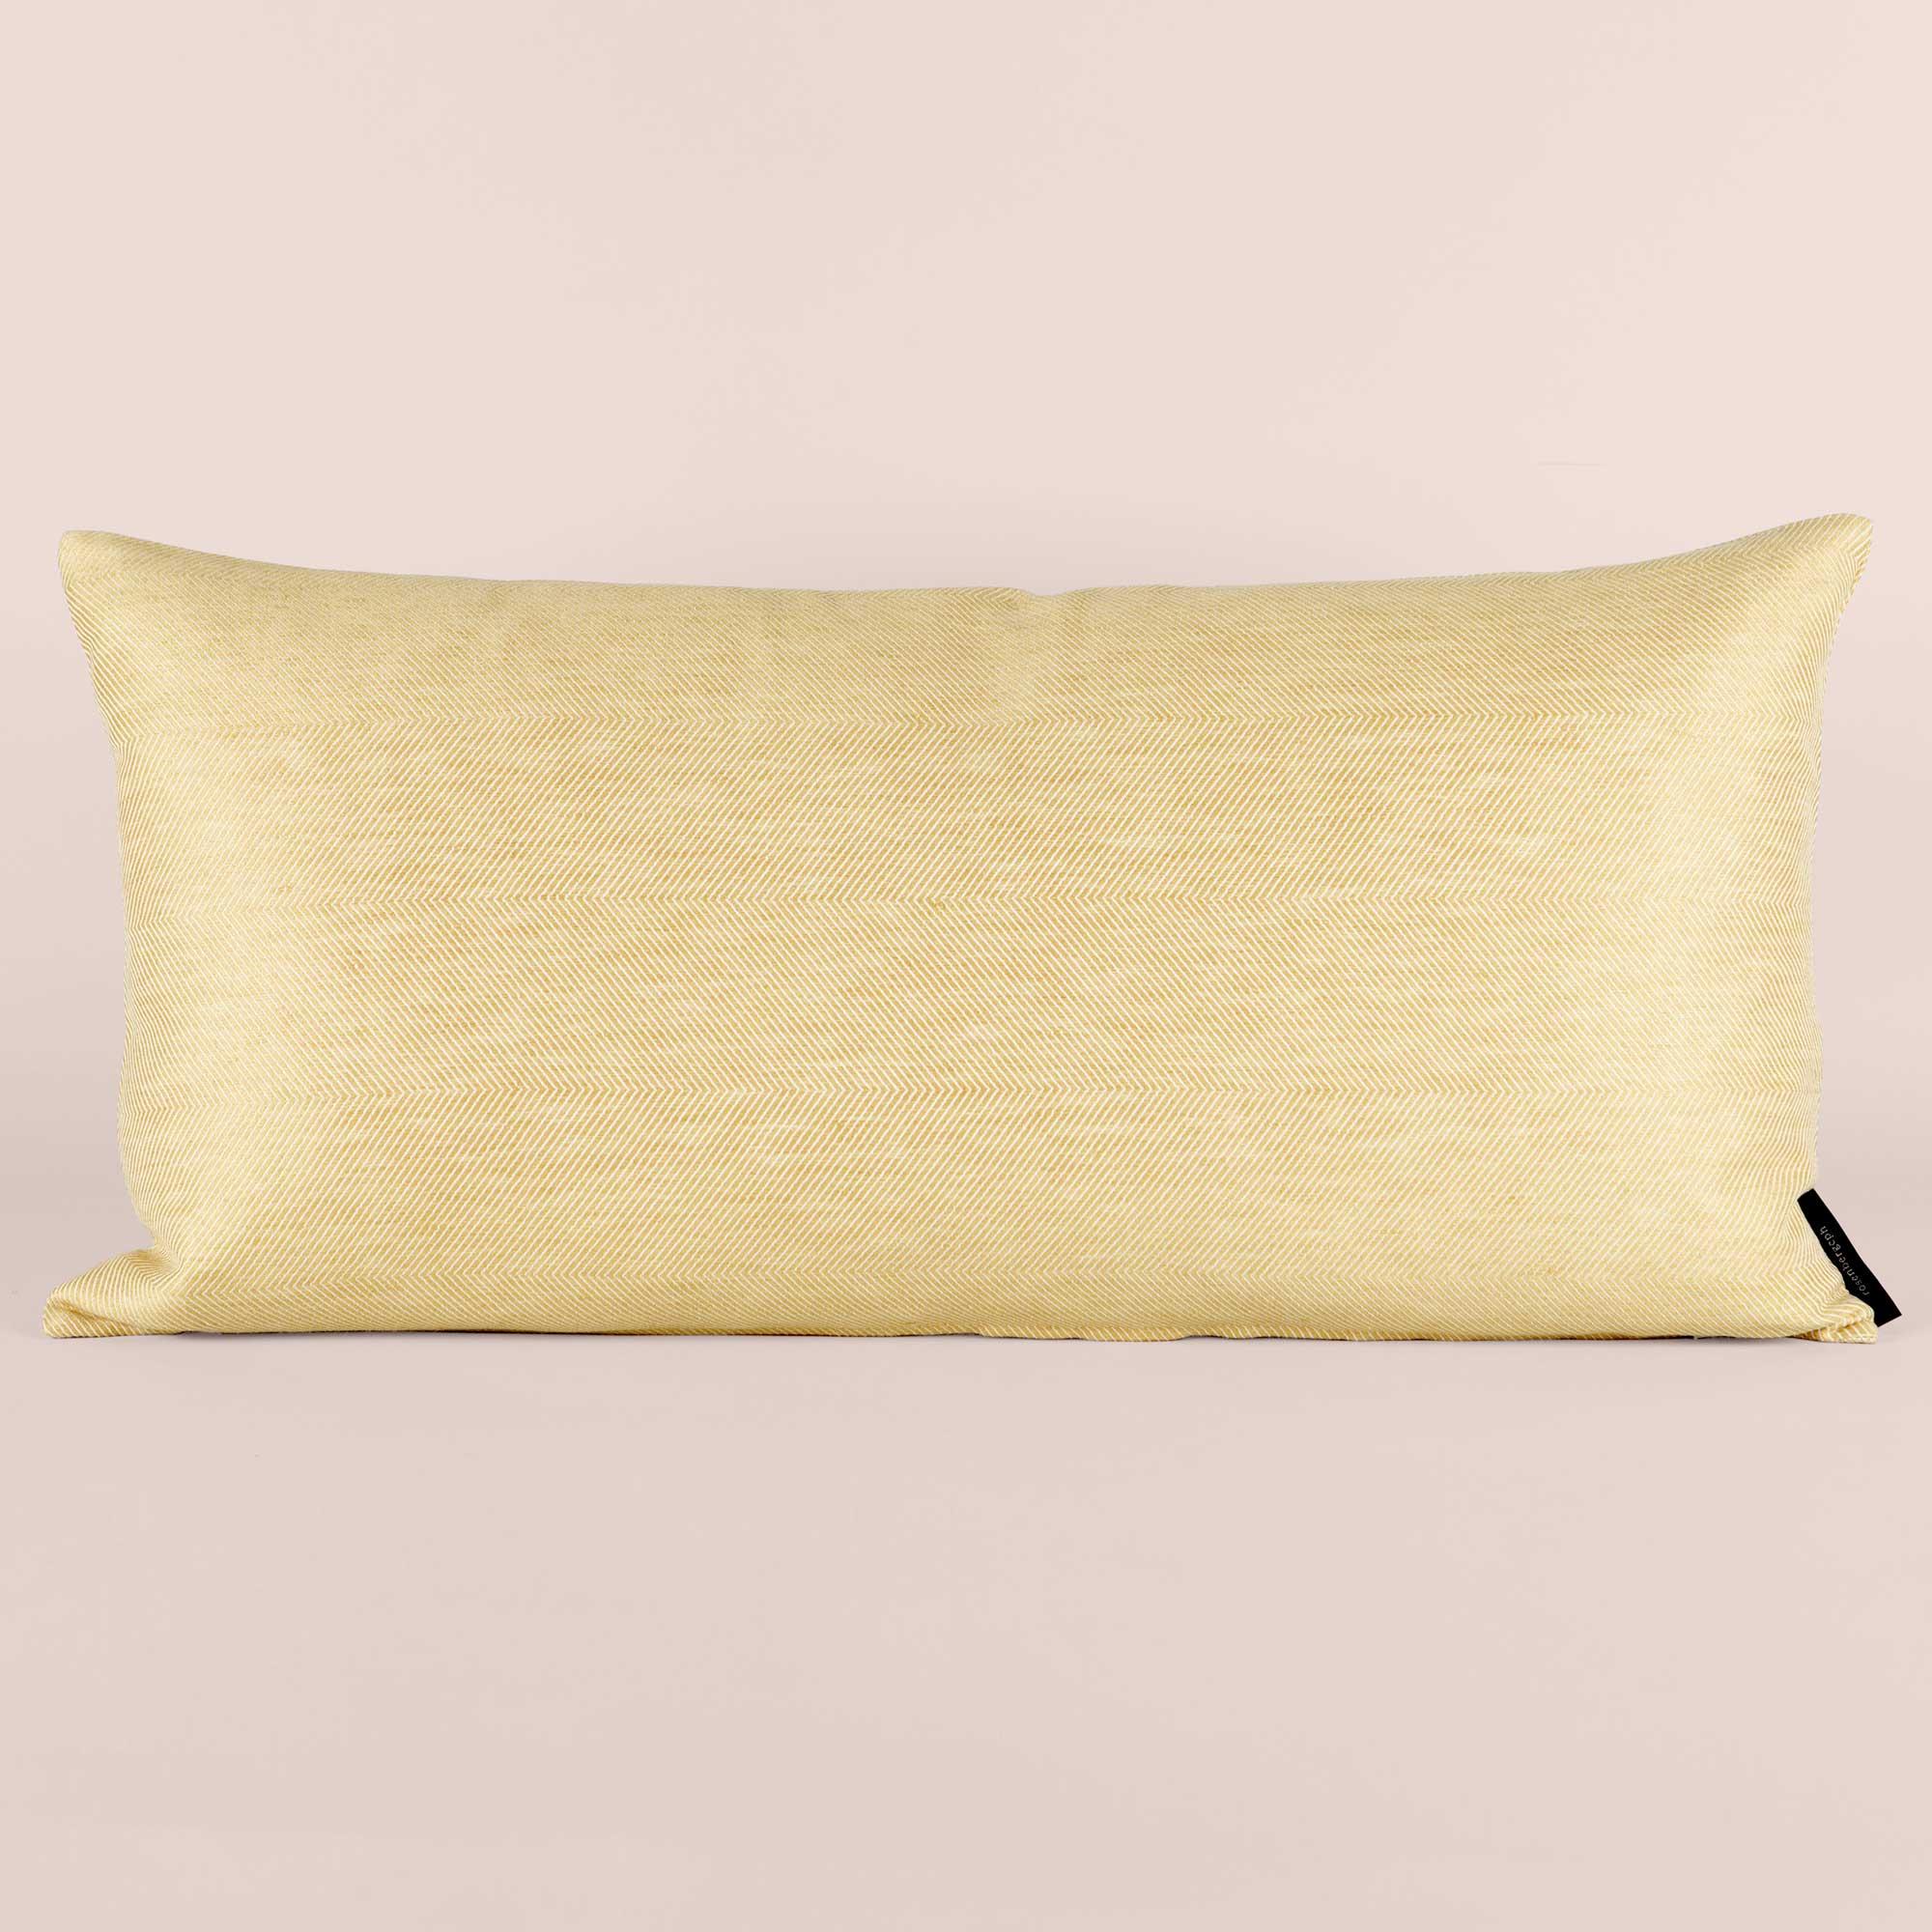 Rectangular cushion linen/cotton hay yellow design by Anne Rosenberg, RosenbergCph